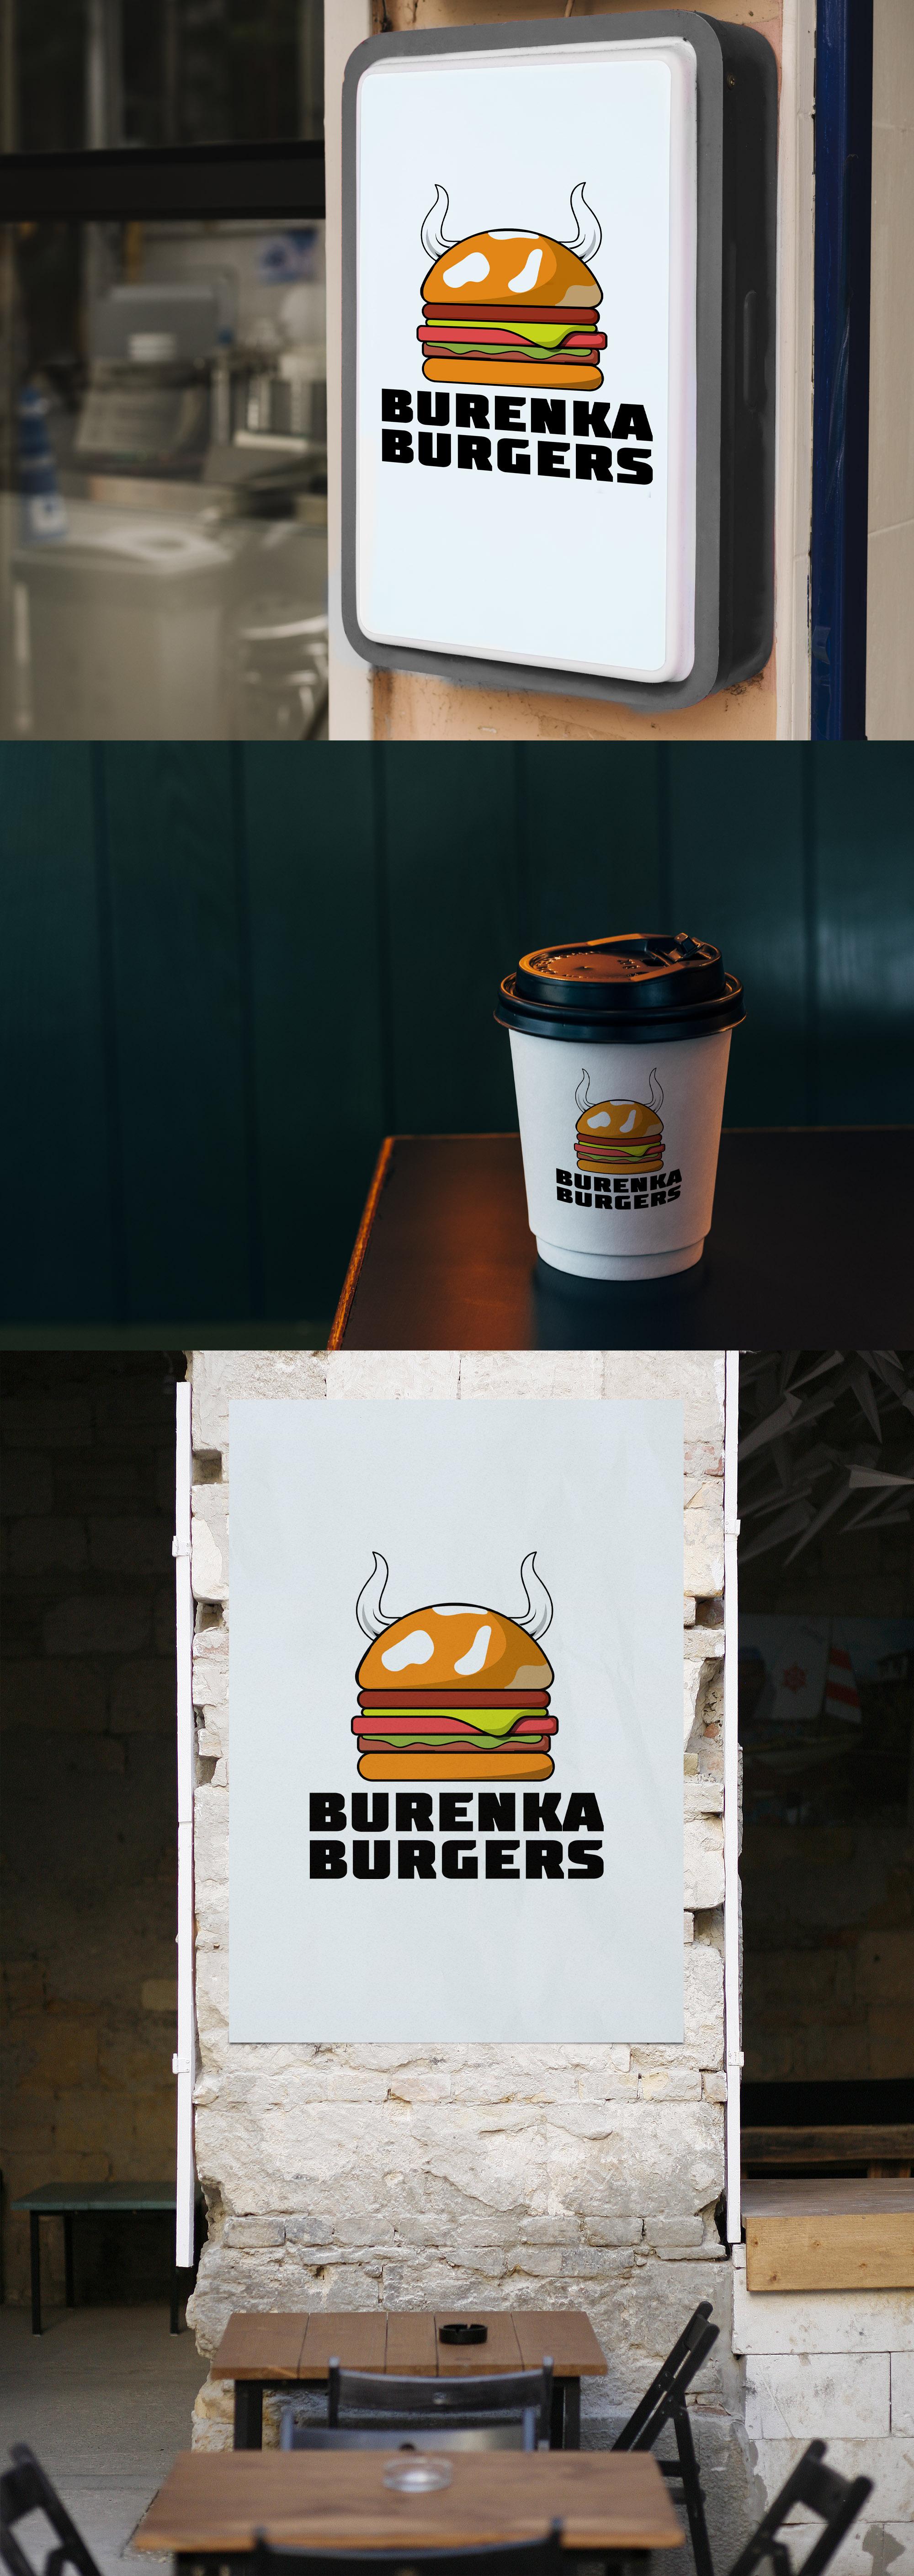 Логотип для Бургерной с Пекарней фото f_3145e14067b0c532.jpg